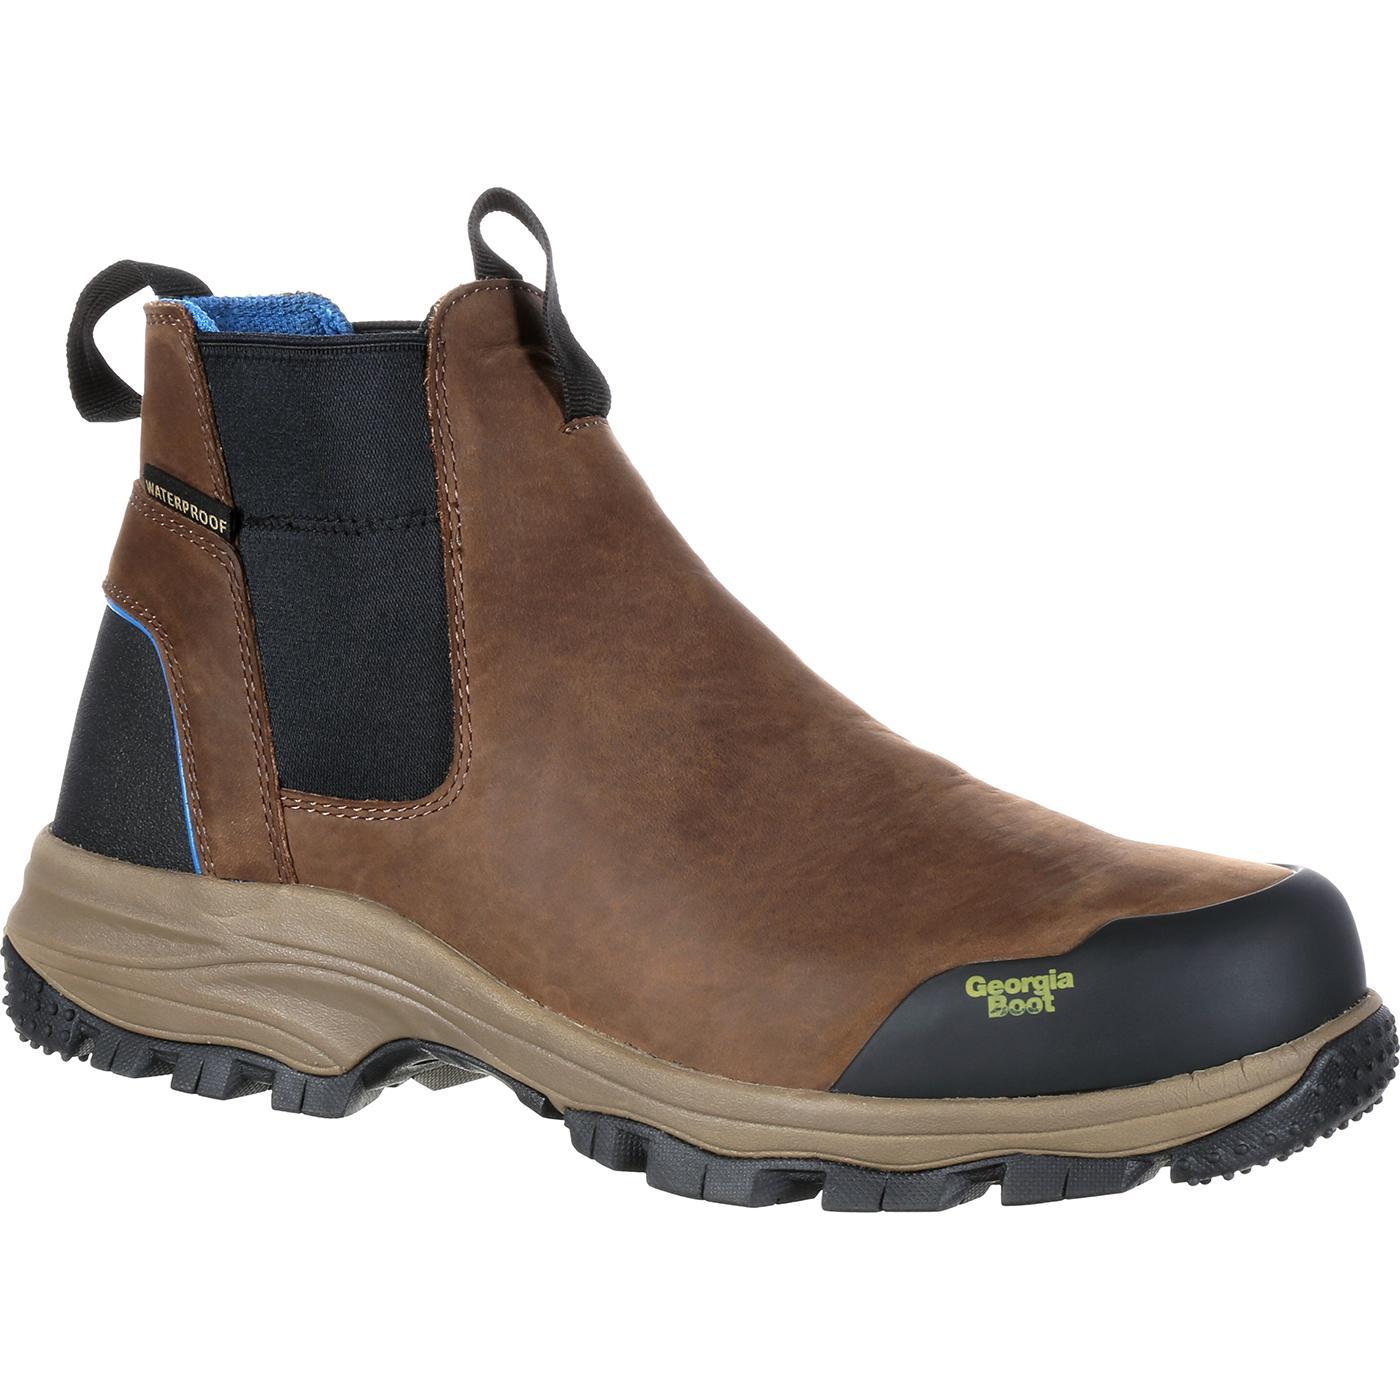 Georgia Boot Blue Collar Waterproof Romeo Pull On Work Boot